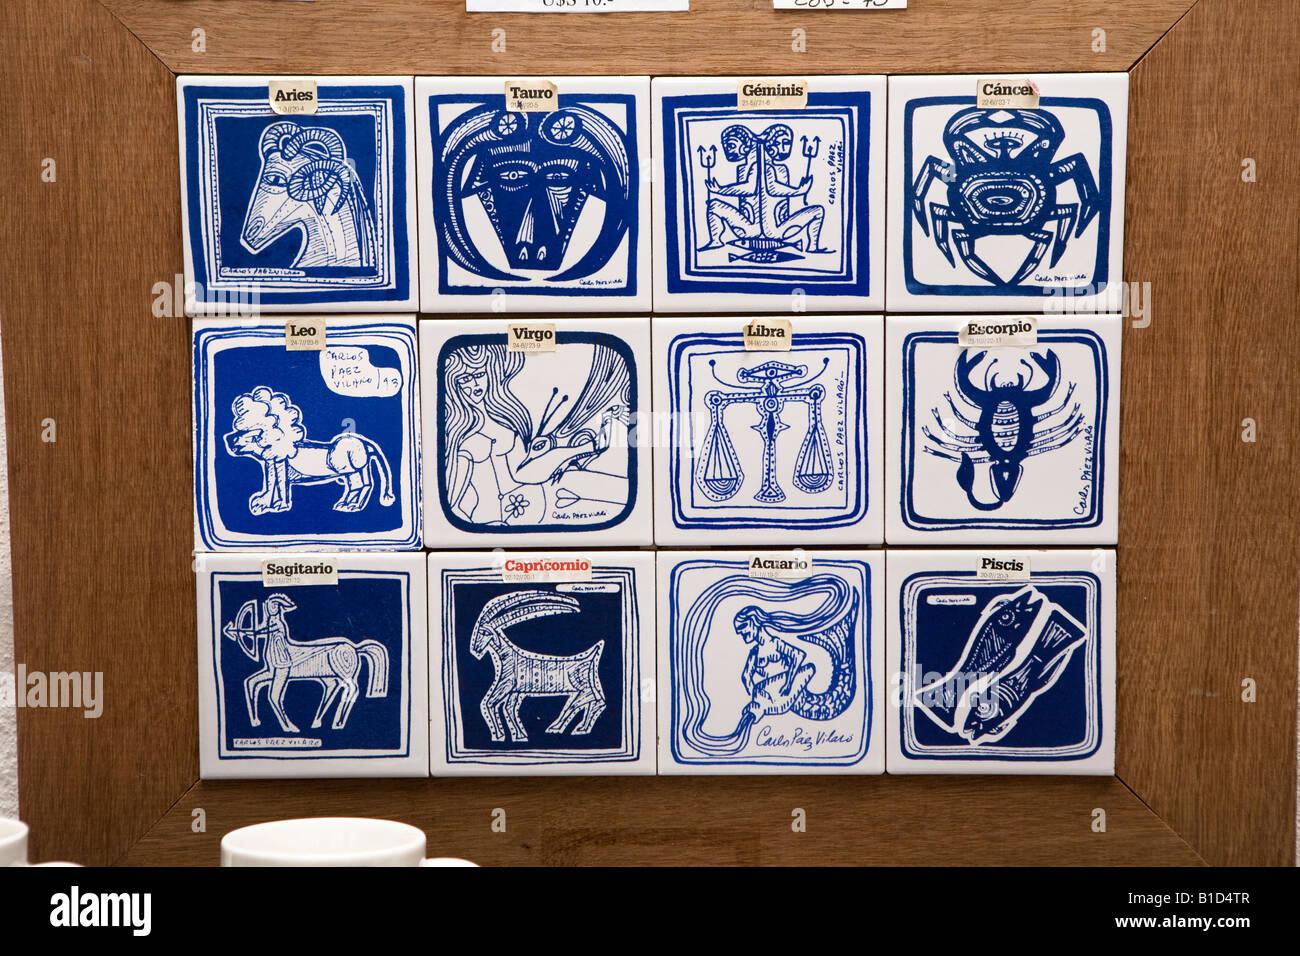 Painted ceramic tiles with zodiac drawings made by uruguayan artist painted ceramic tiles with zodiac drawings made by uruguayan artist carlos paez vilaro in museum casapueblo punta del este dailygadgetfo Image collections